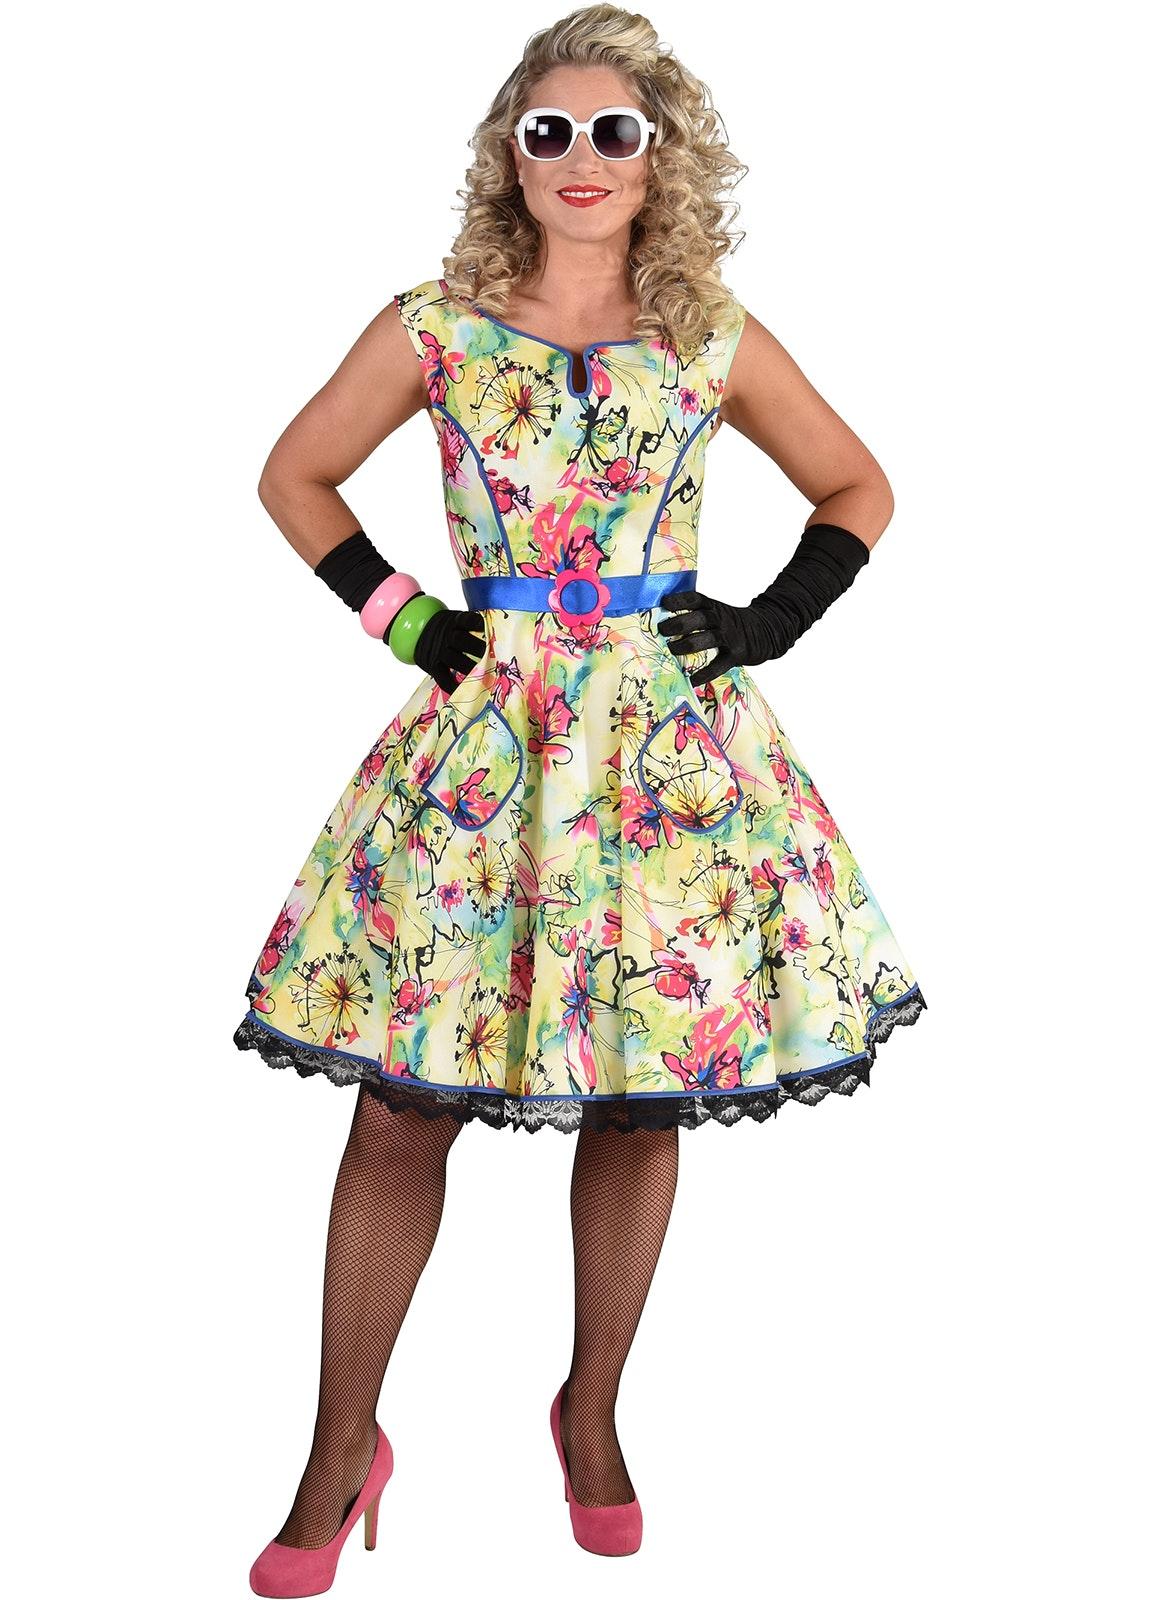 50's Rock 'n roll jurk bloesem